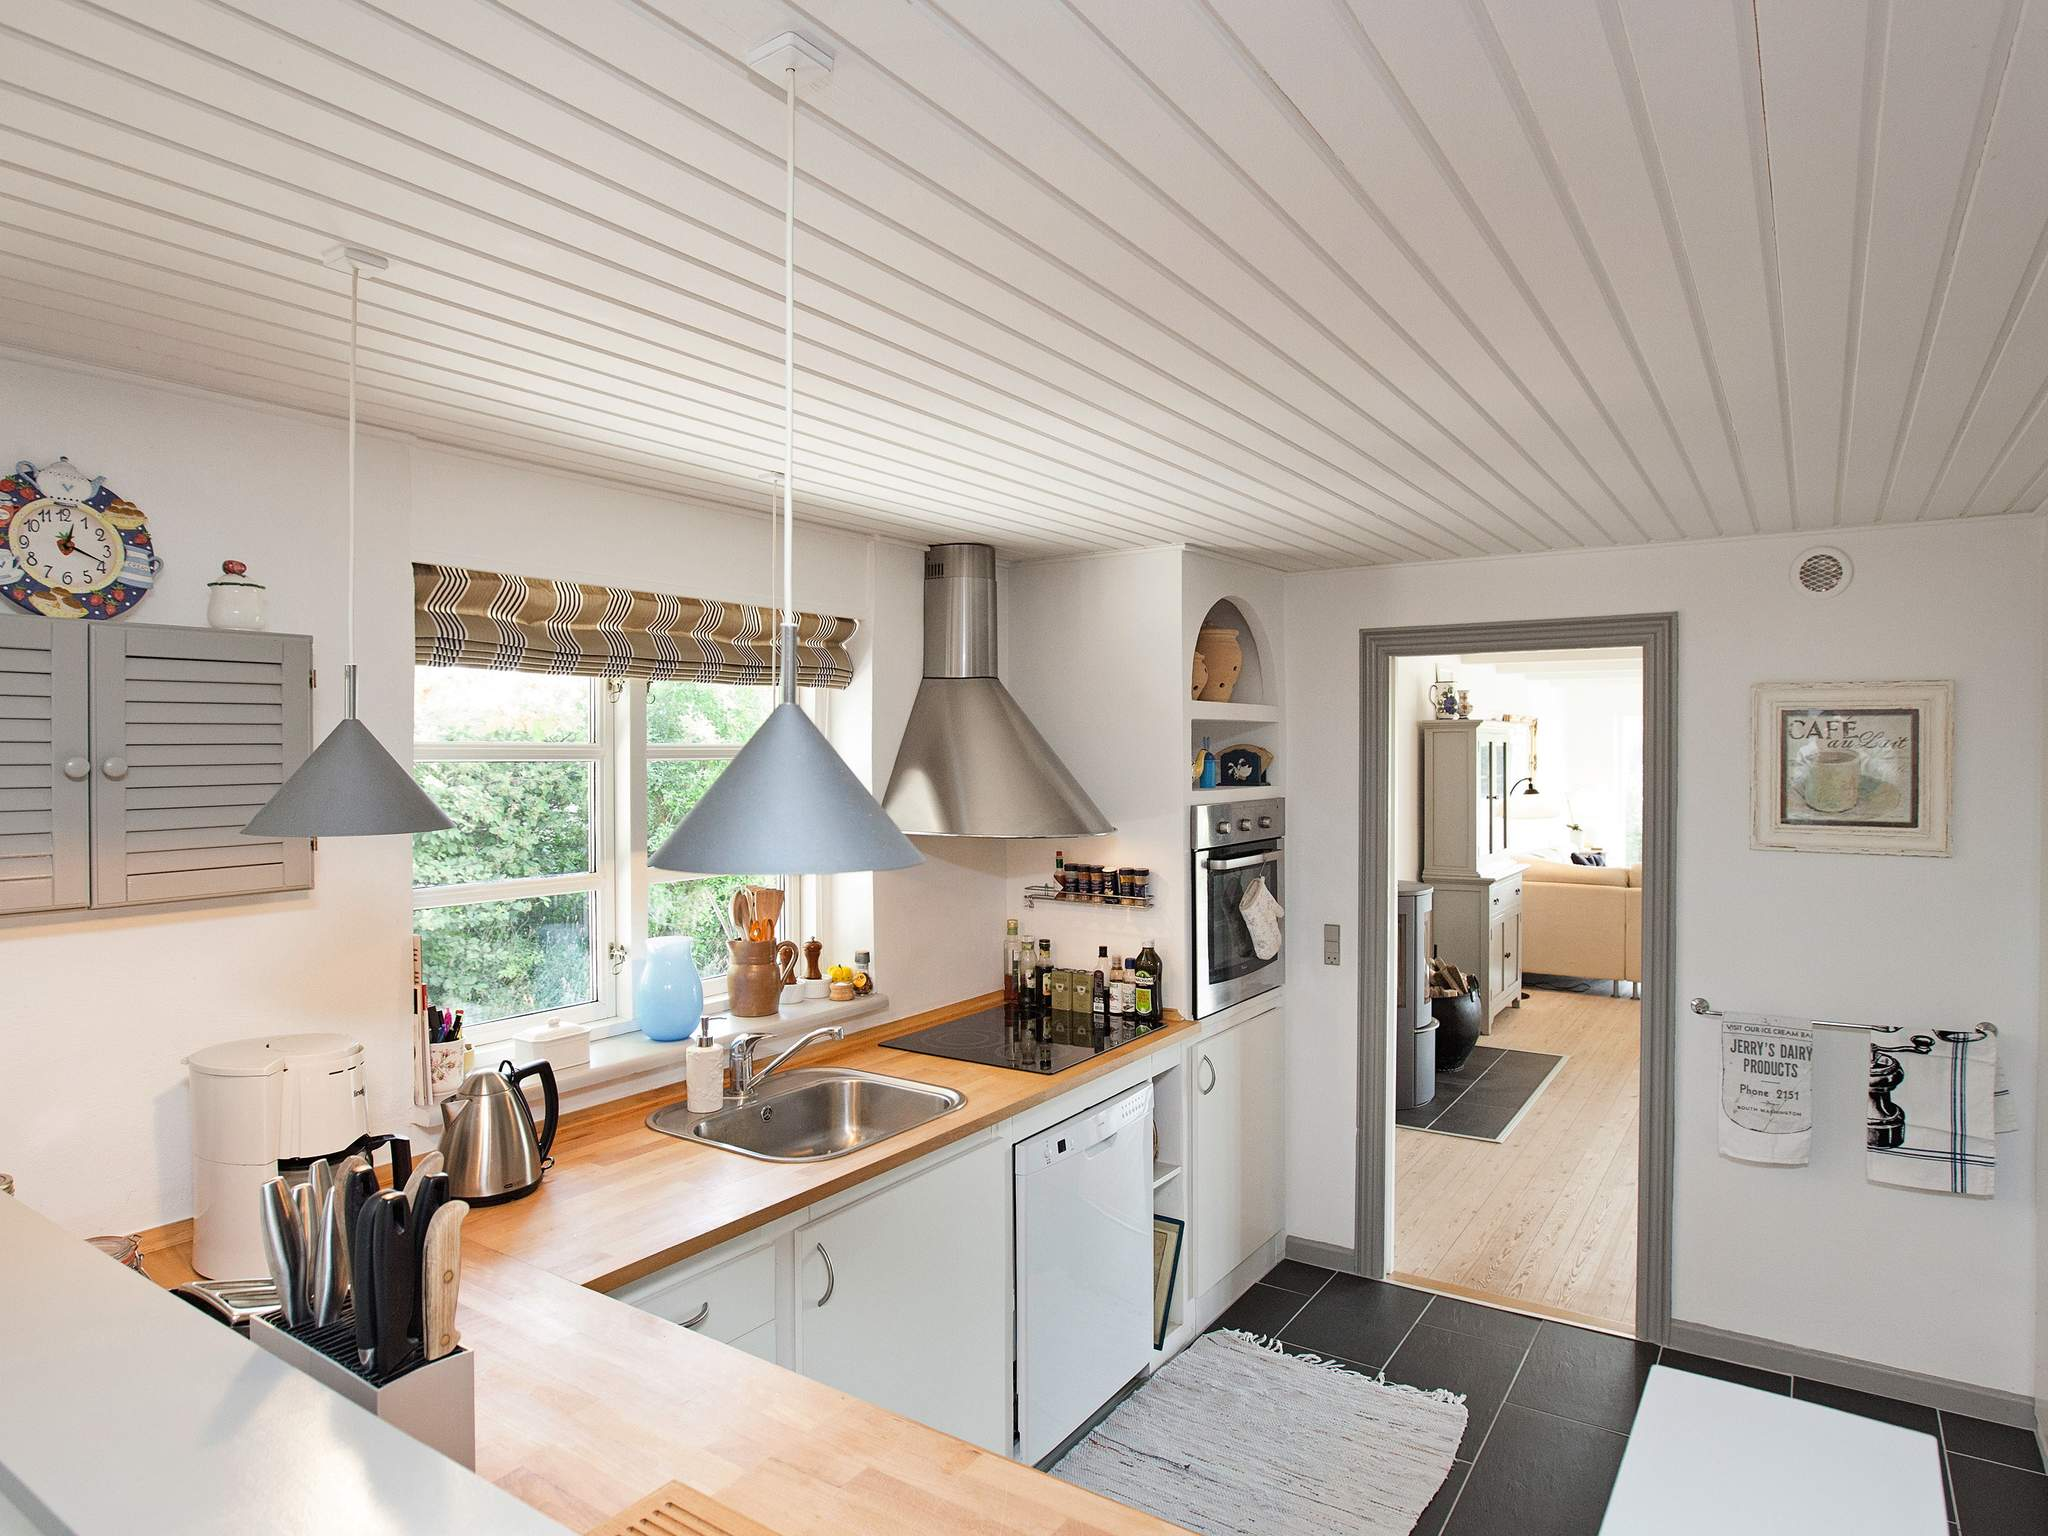 Ferienhaus Vejby Strand (319895), Vejby, , Nordseeland, Dänemark, Bild 7